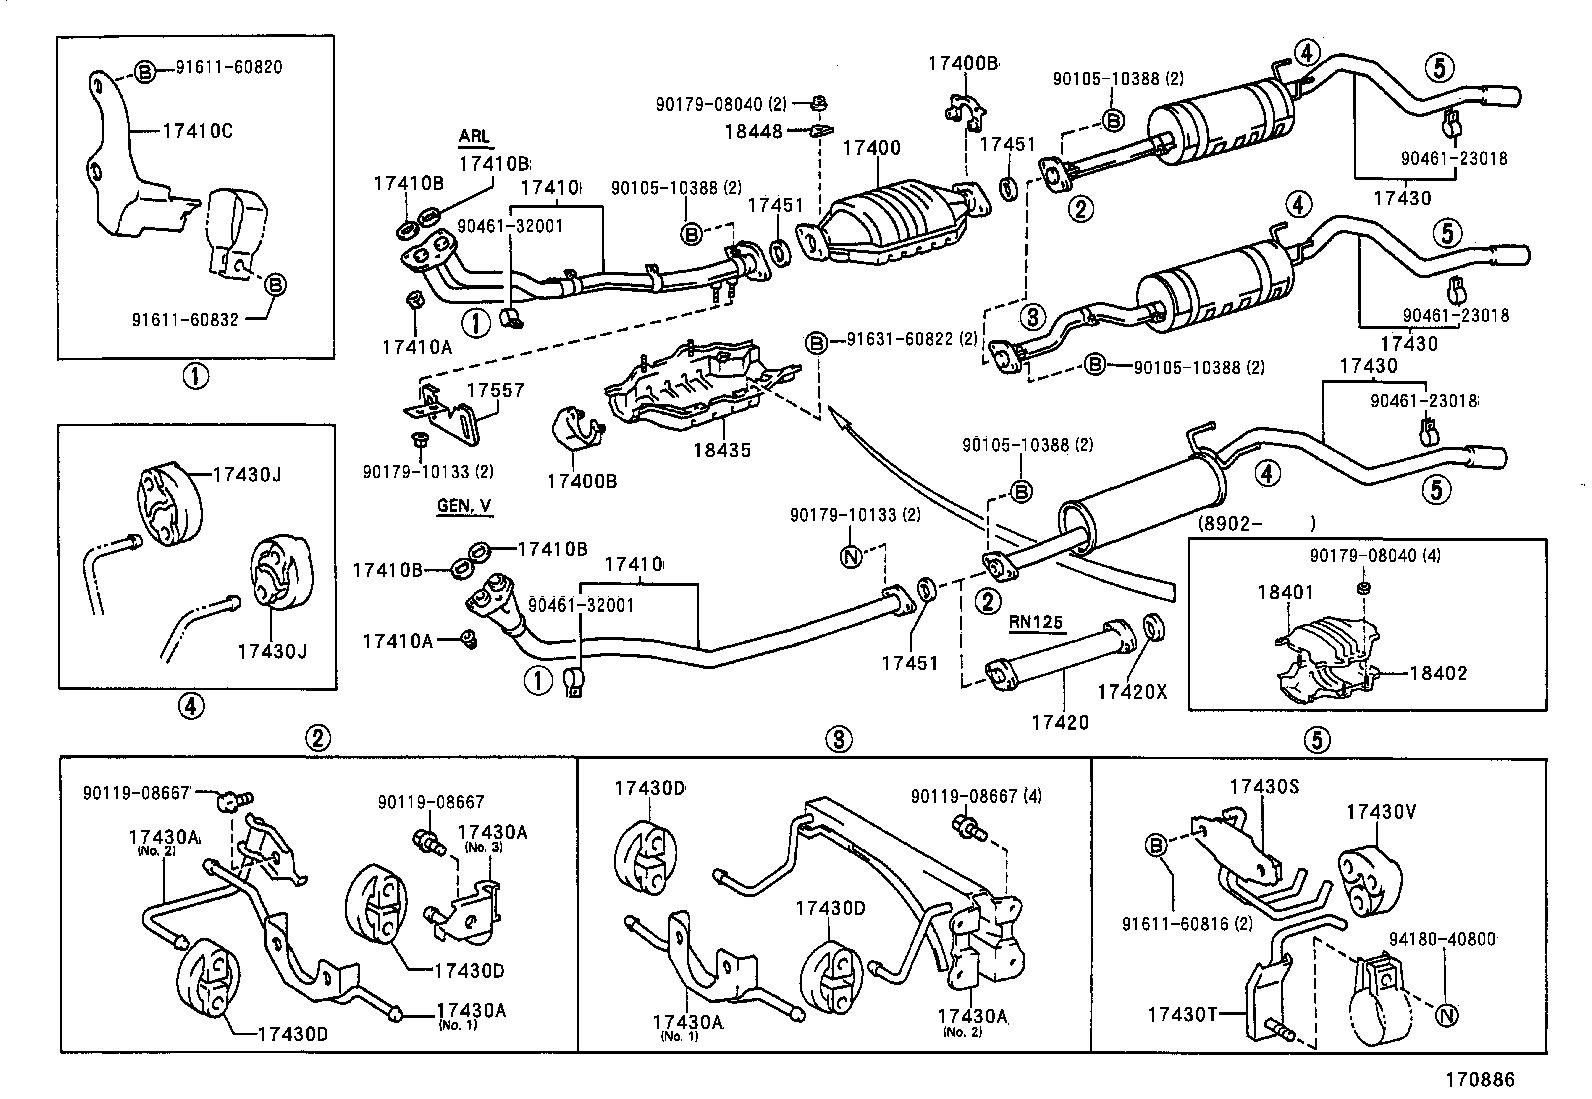 1993 toyota previa parts diagram